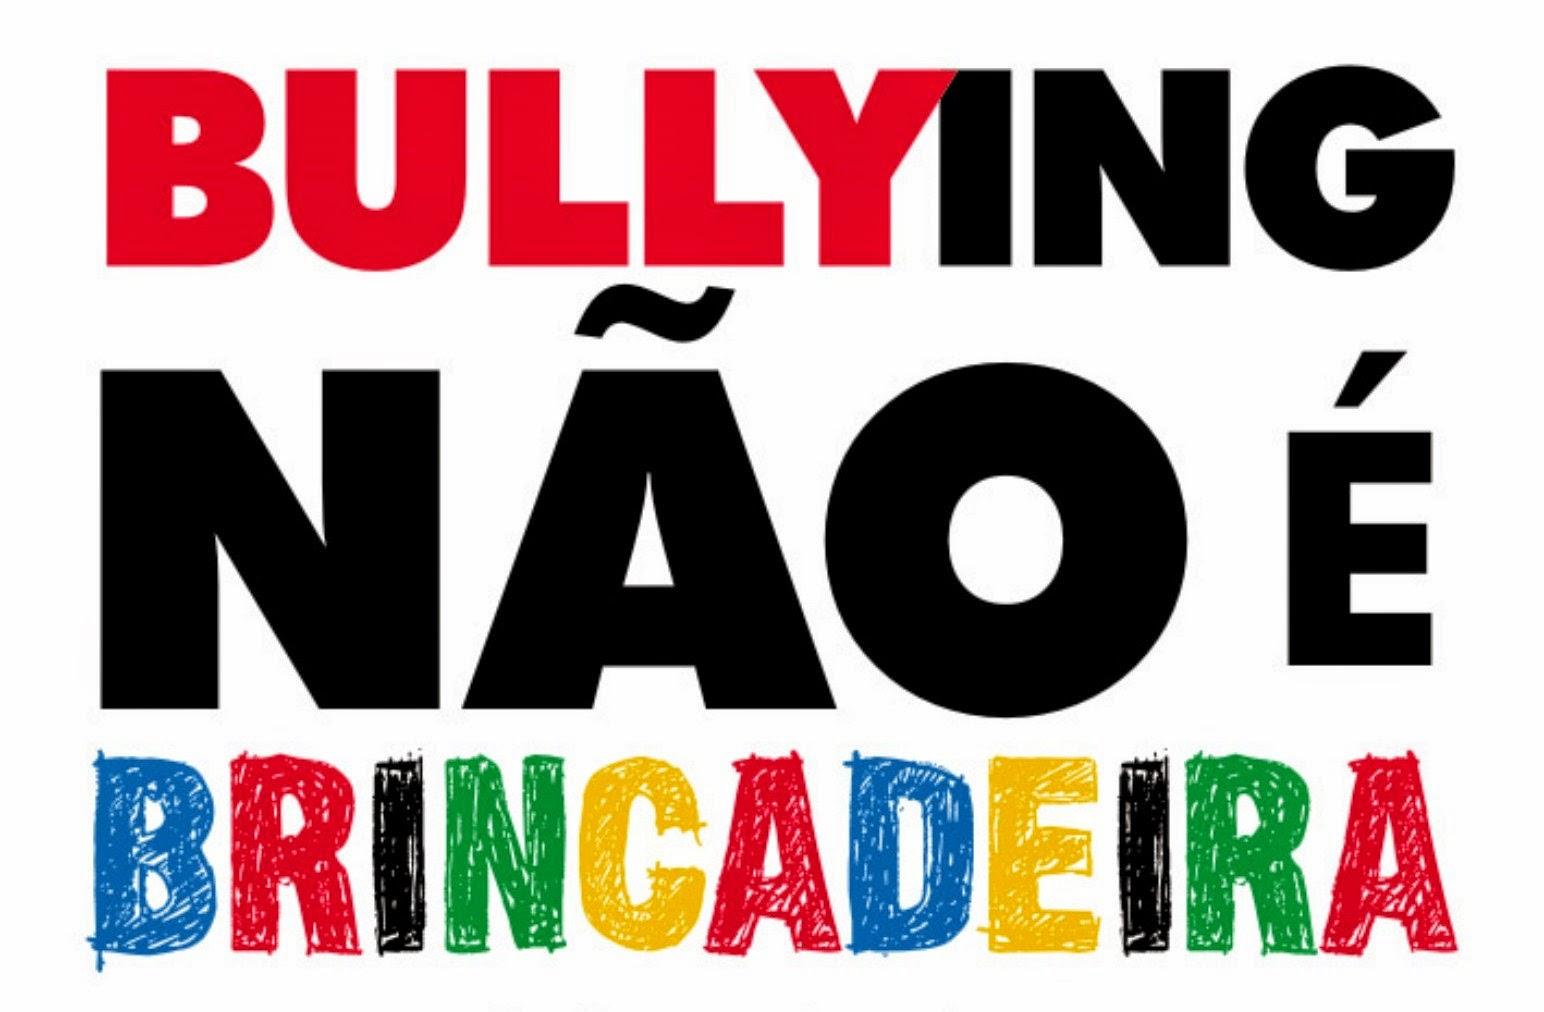 NÃO AO BULLYNG!